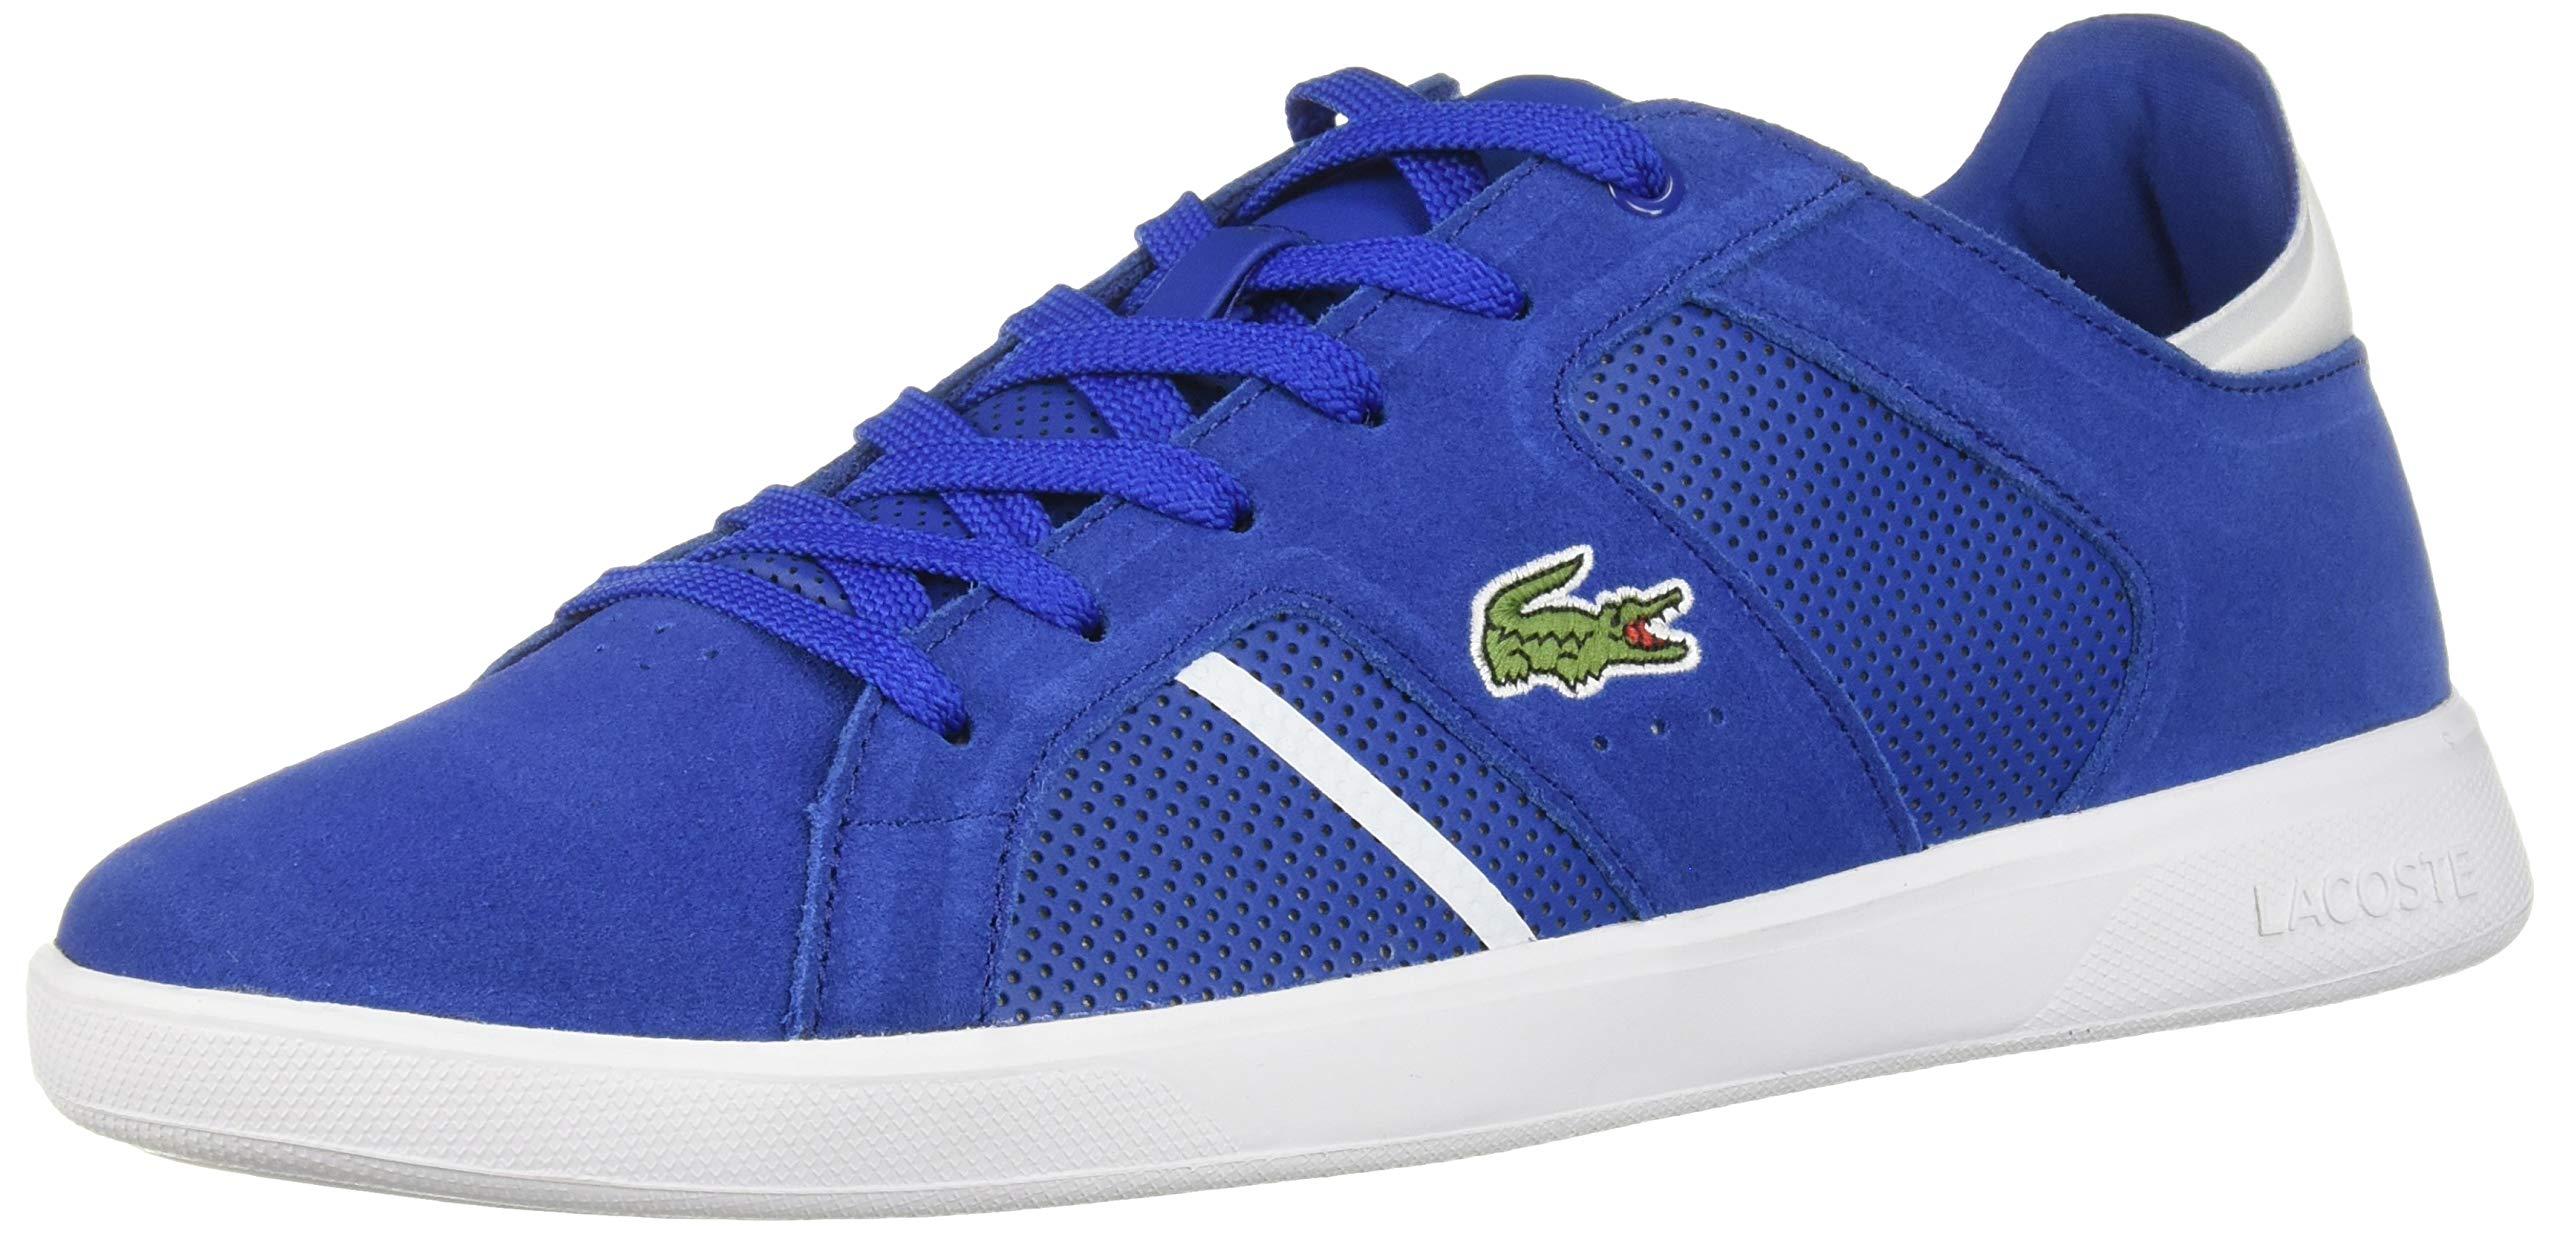 Lacoste Men's Novas Sneaker- Buy Online